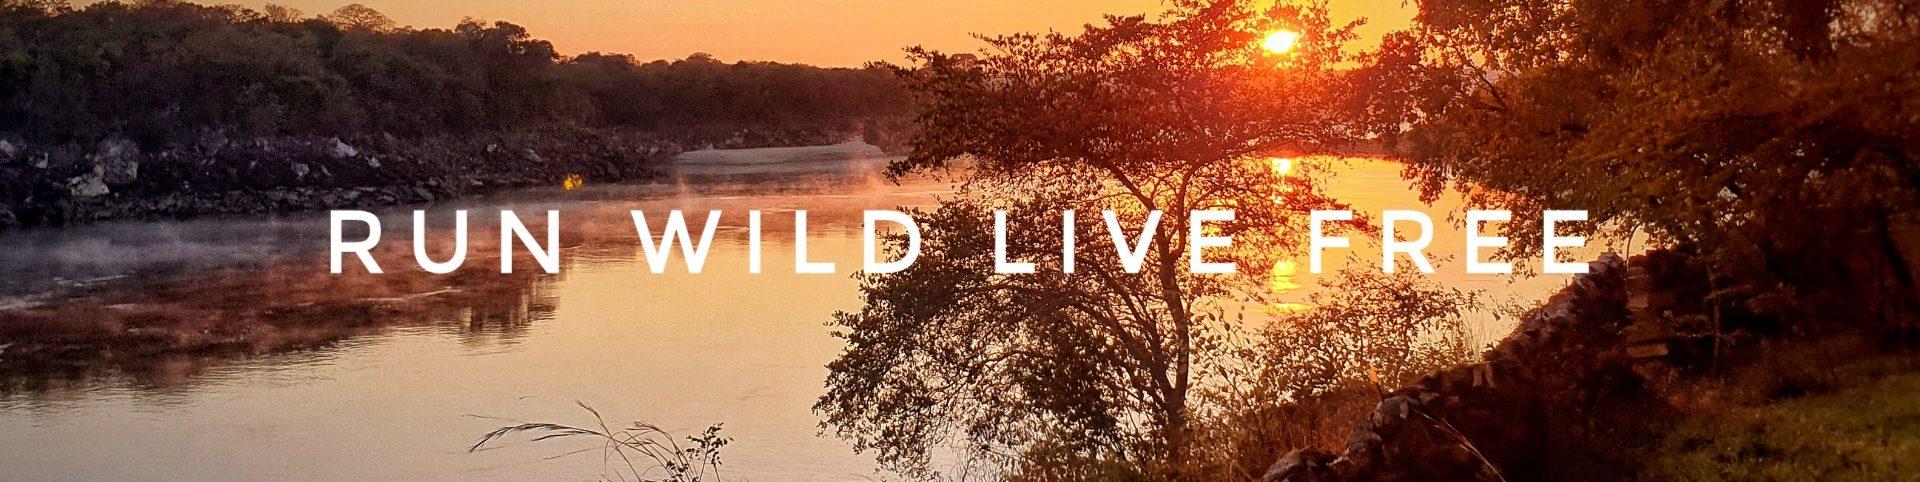 run wild live free